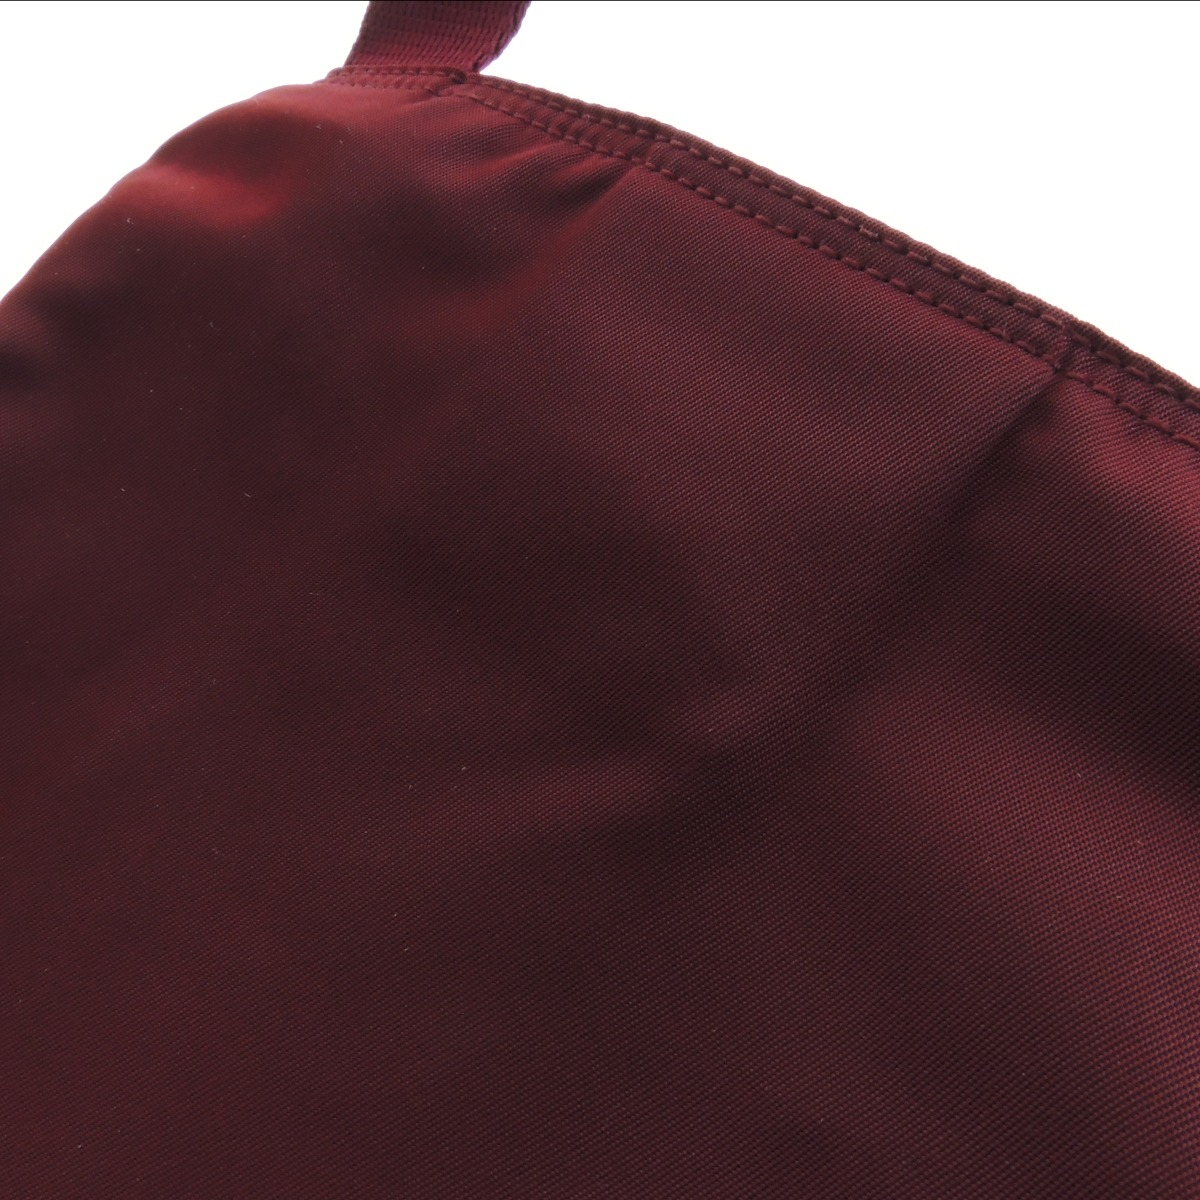 B7792 普拉达肩袋尼龙材料女士